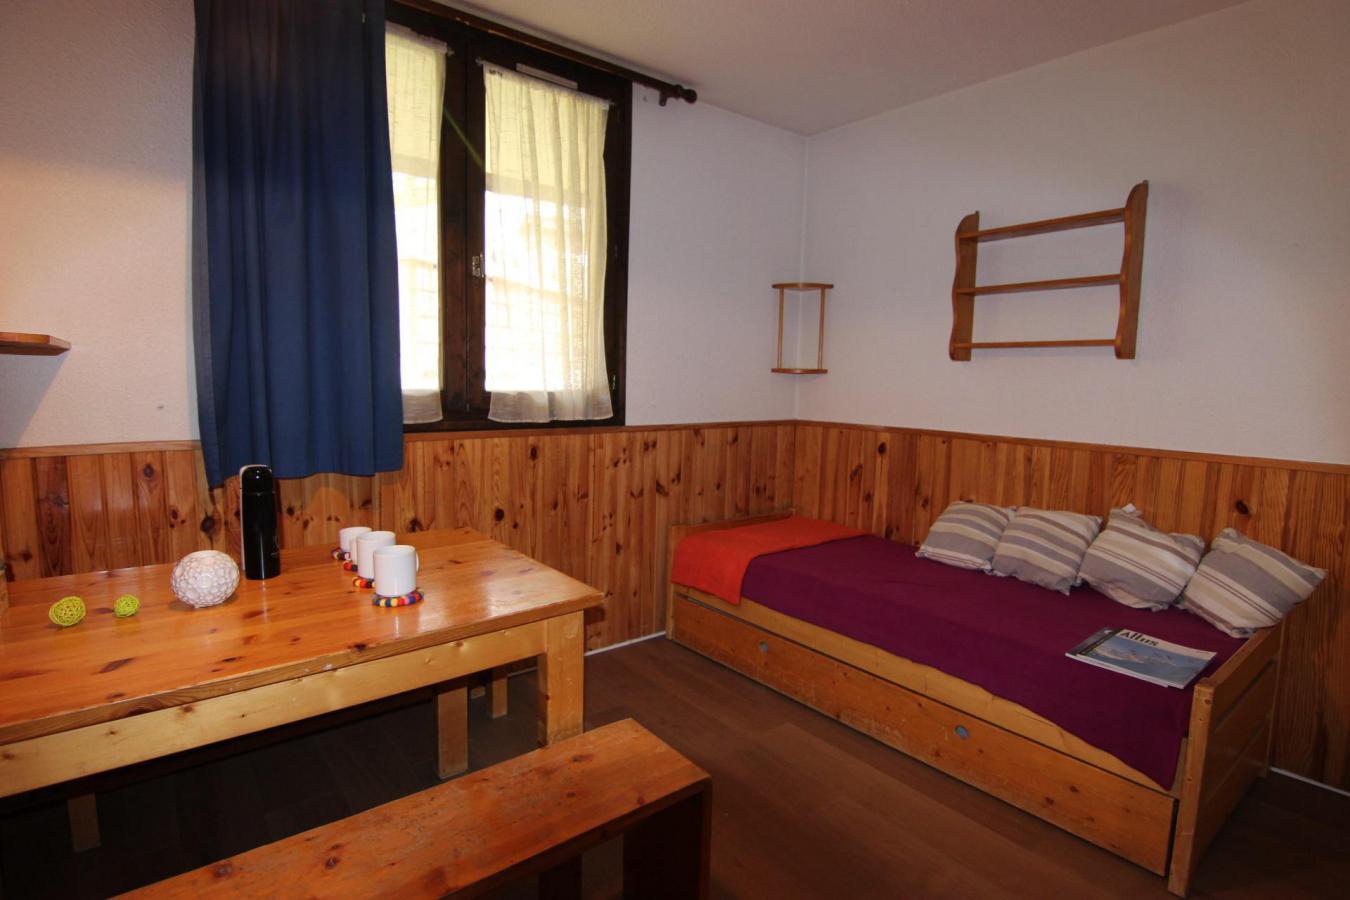 Location au ski Studio 2 personnes (145) - Residence Roche Blanche - Val Thorens - Lavabo